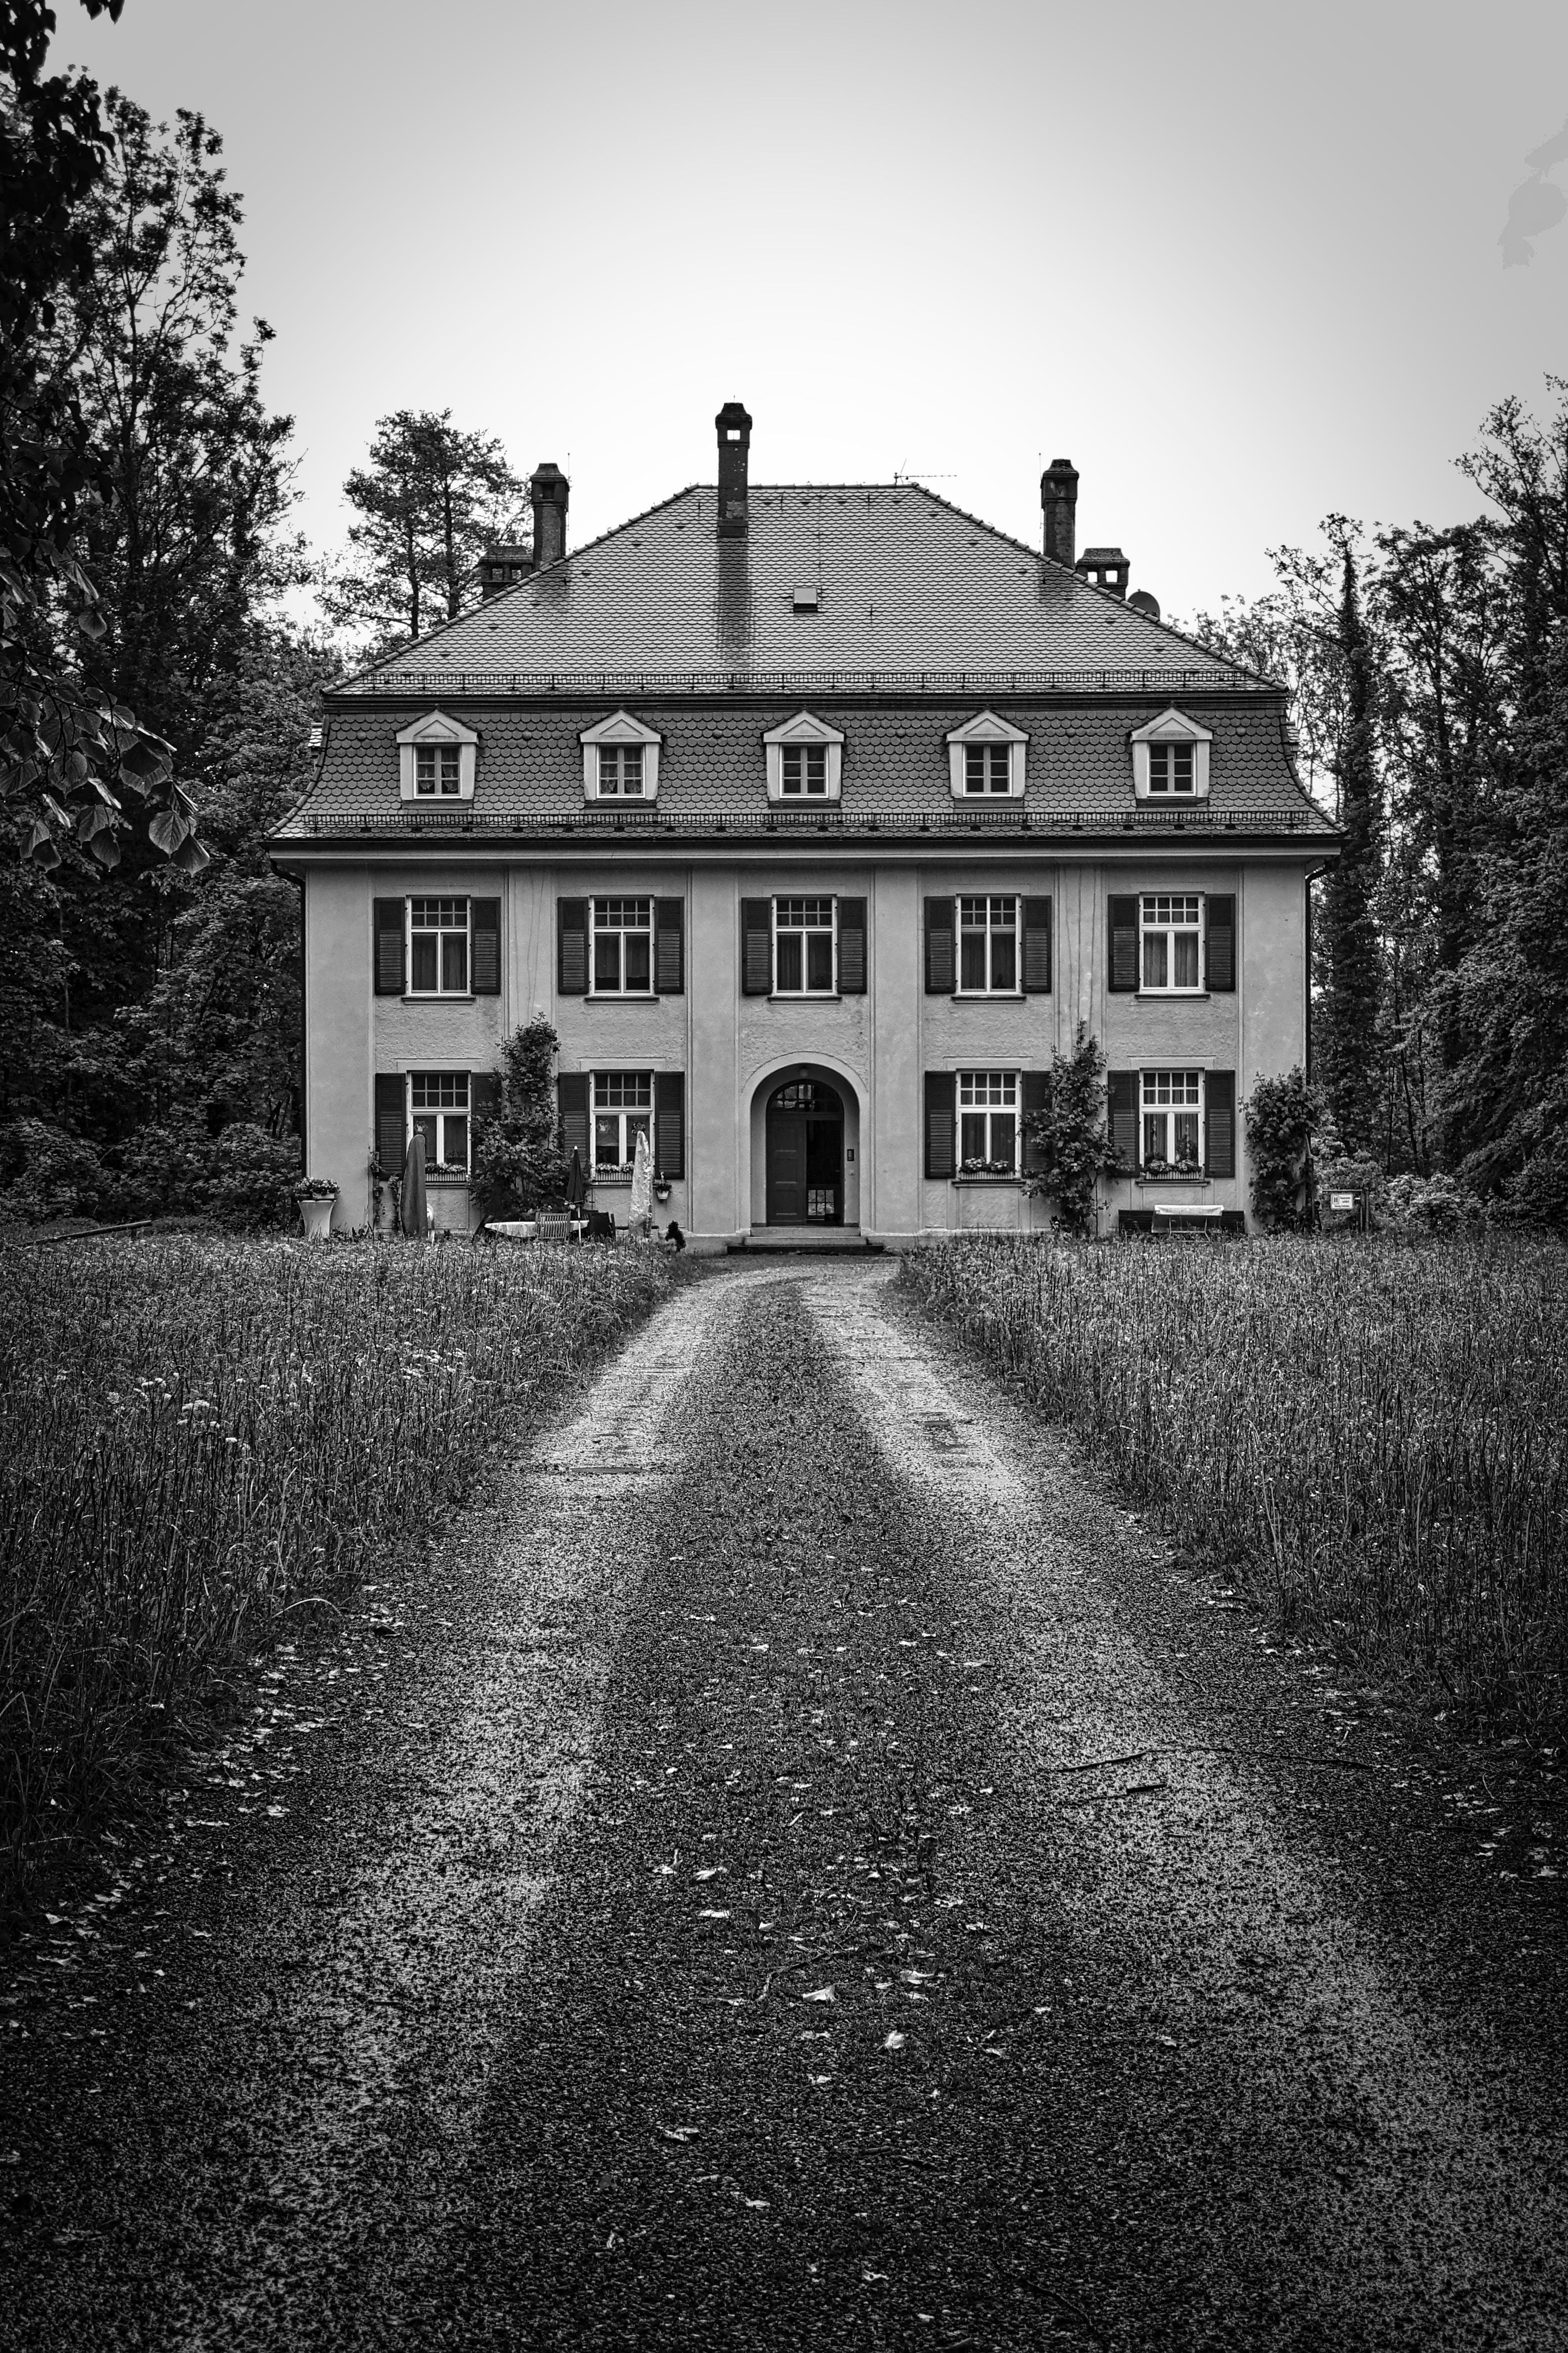 architecture, black and white, driveway